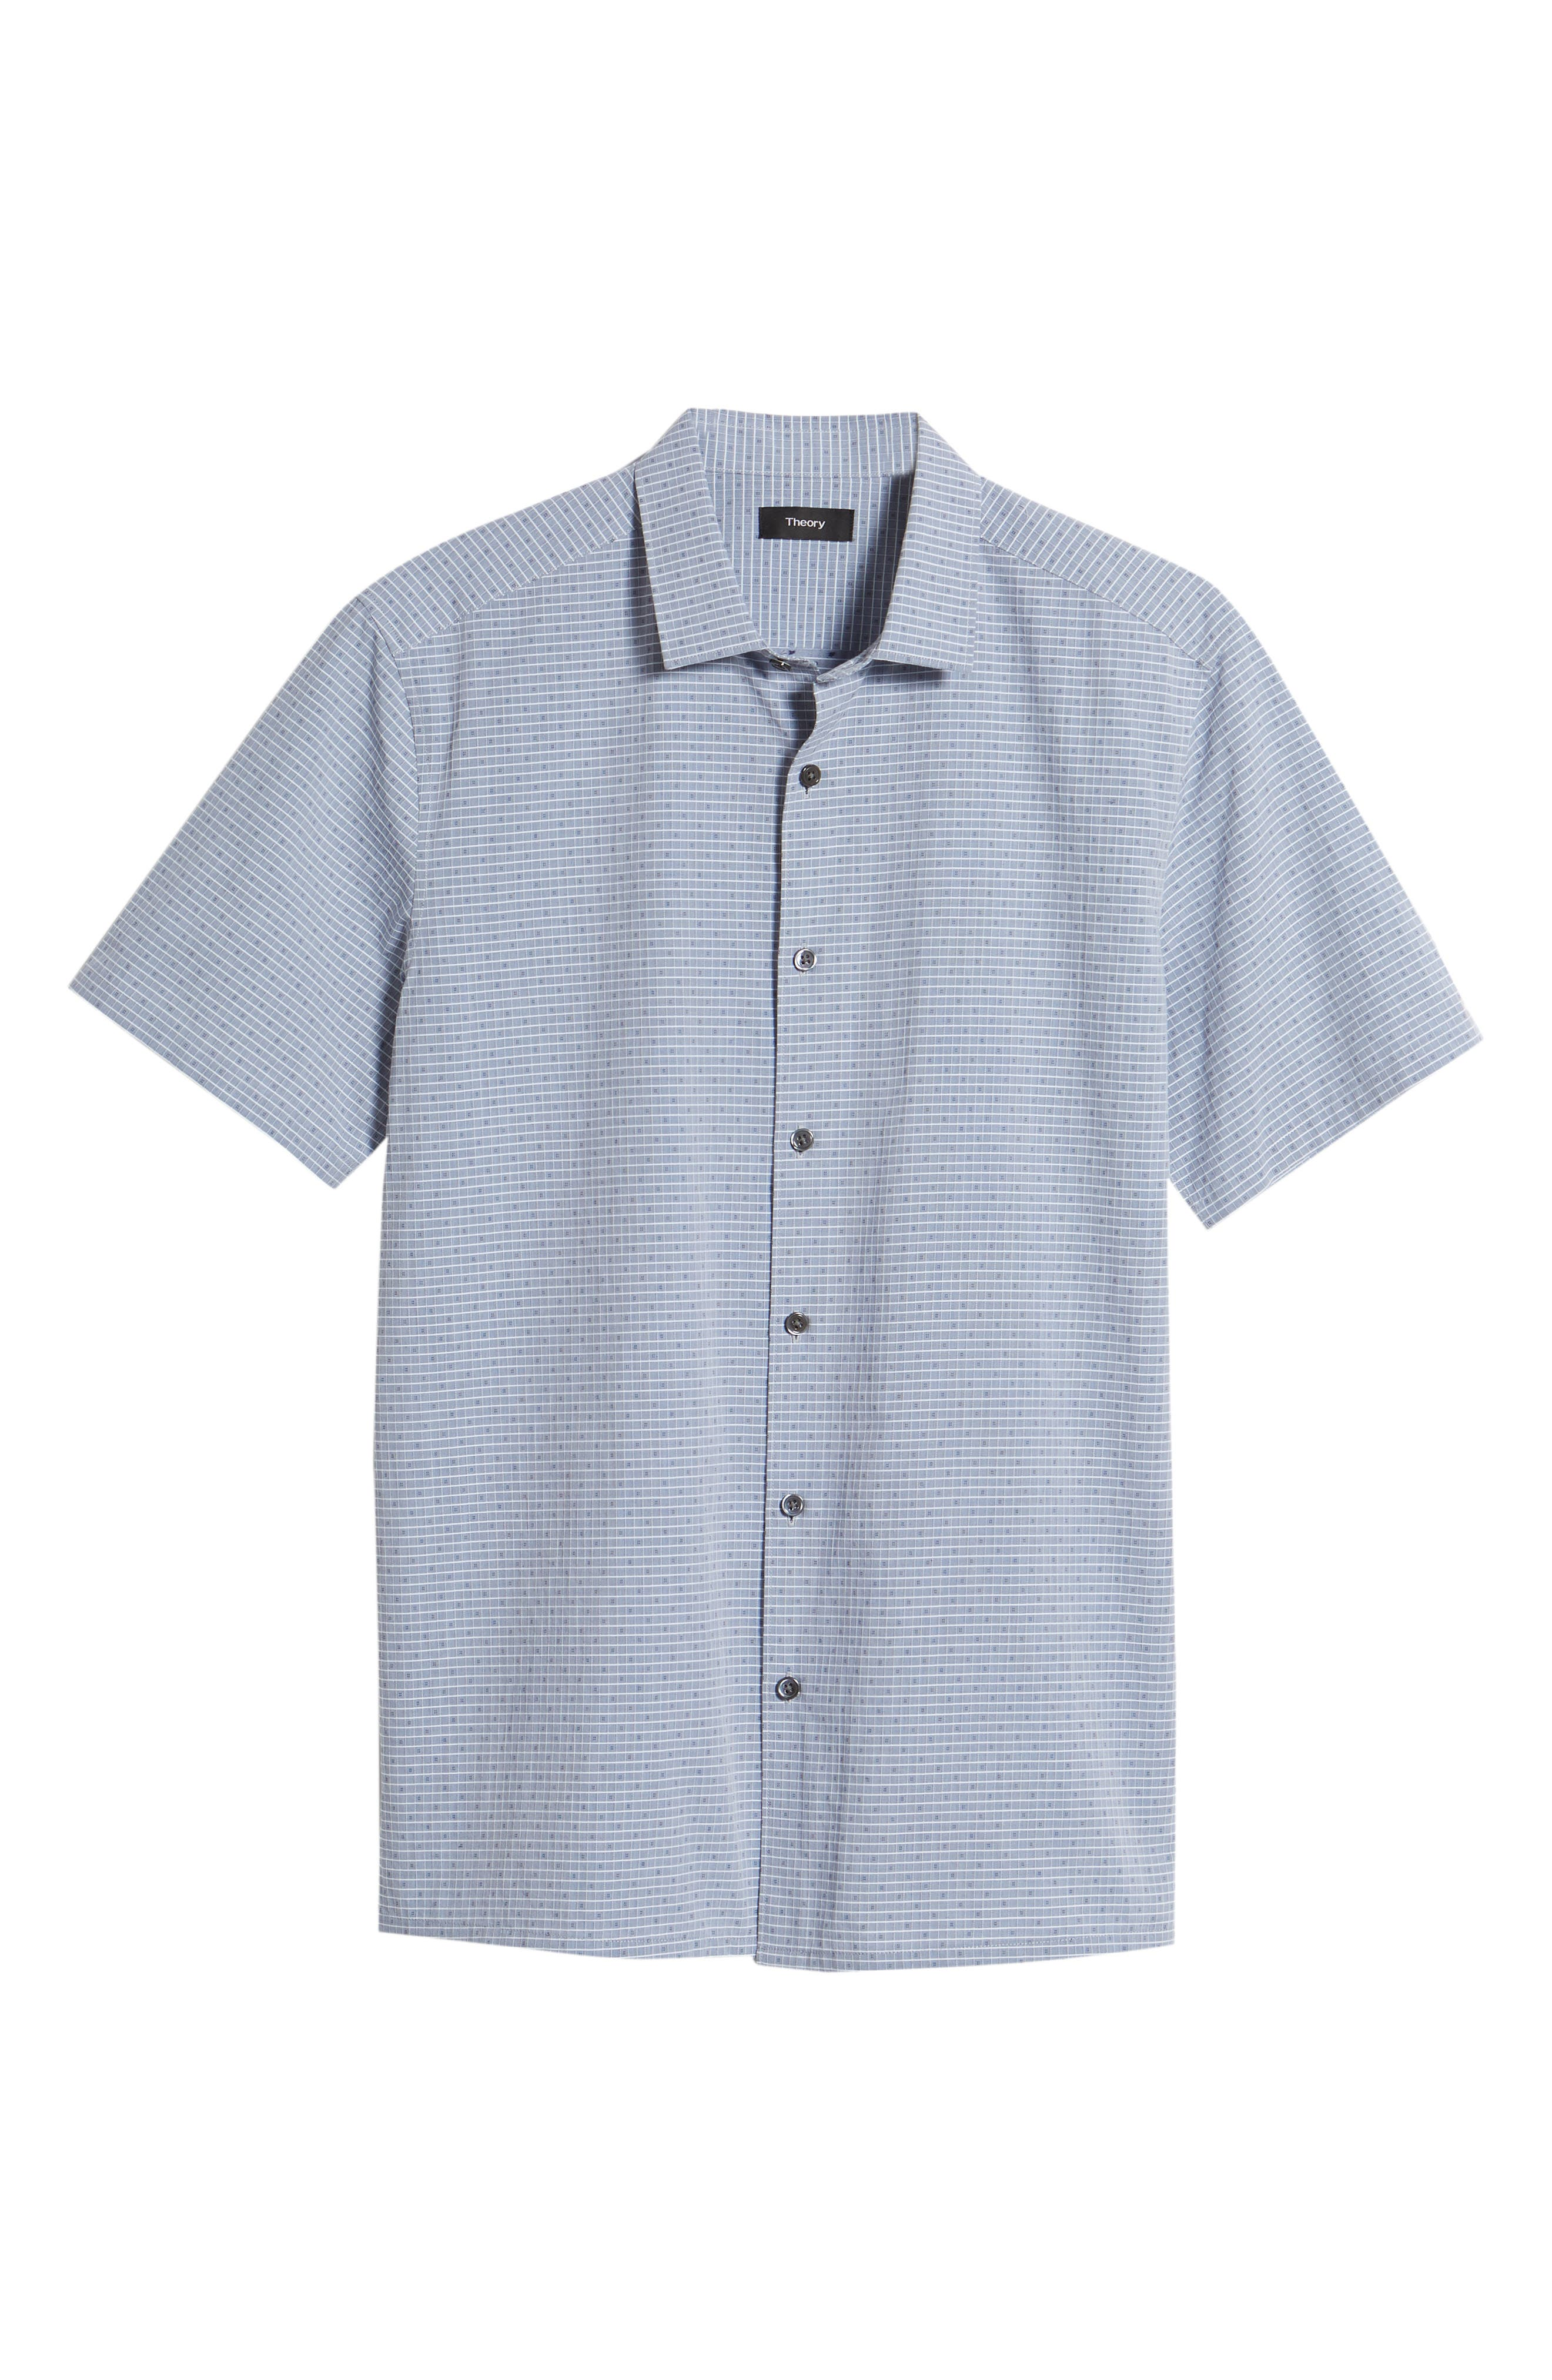 Murray Trim Fit Check Short Sleeve Sport Shirt,                             Alternate thumbnail 6, color,                             Eclipse Multi